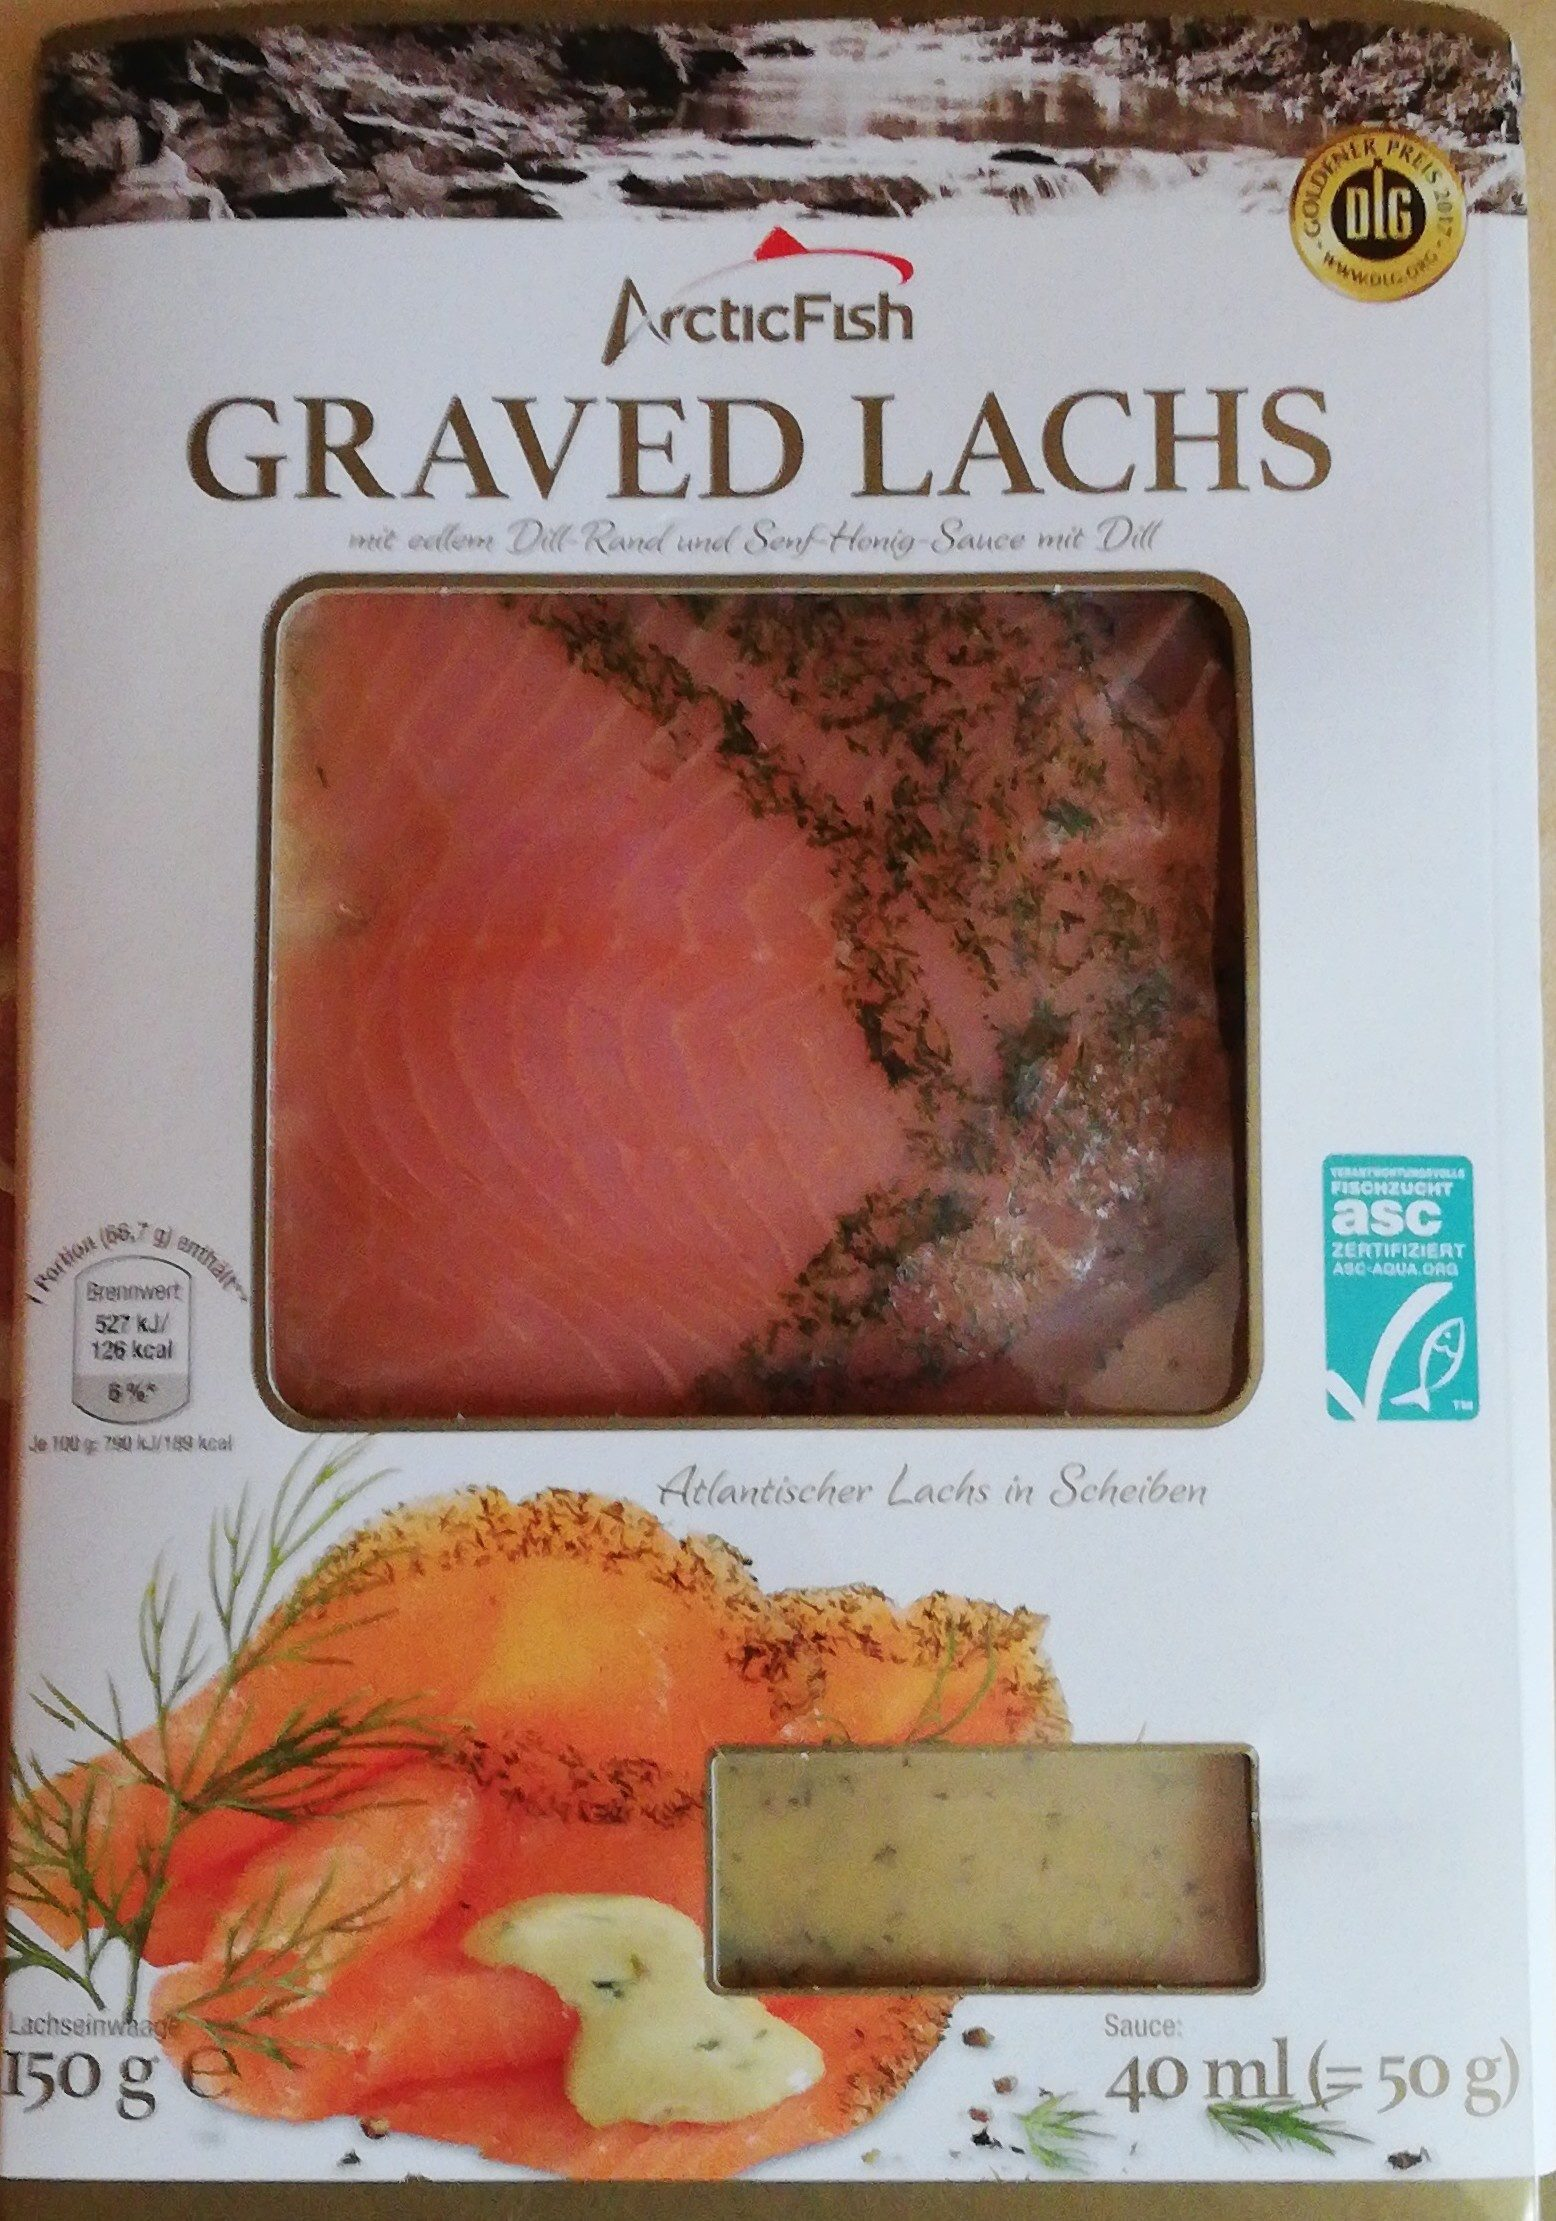 Graved Lachs mit Dill Senf Honig Sauce - Product - de